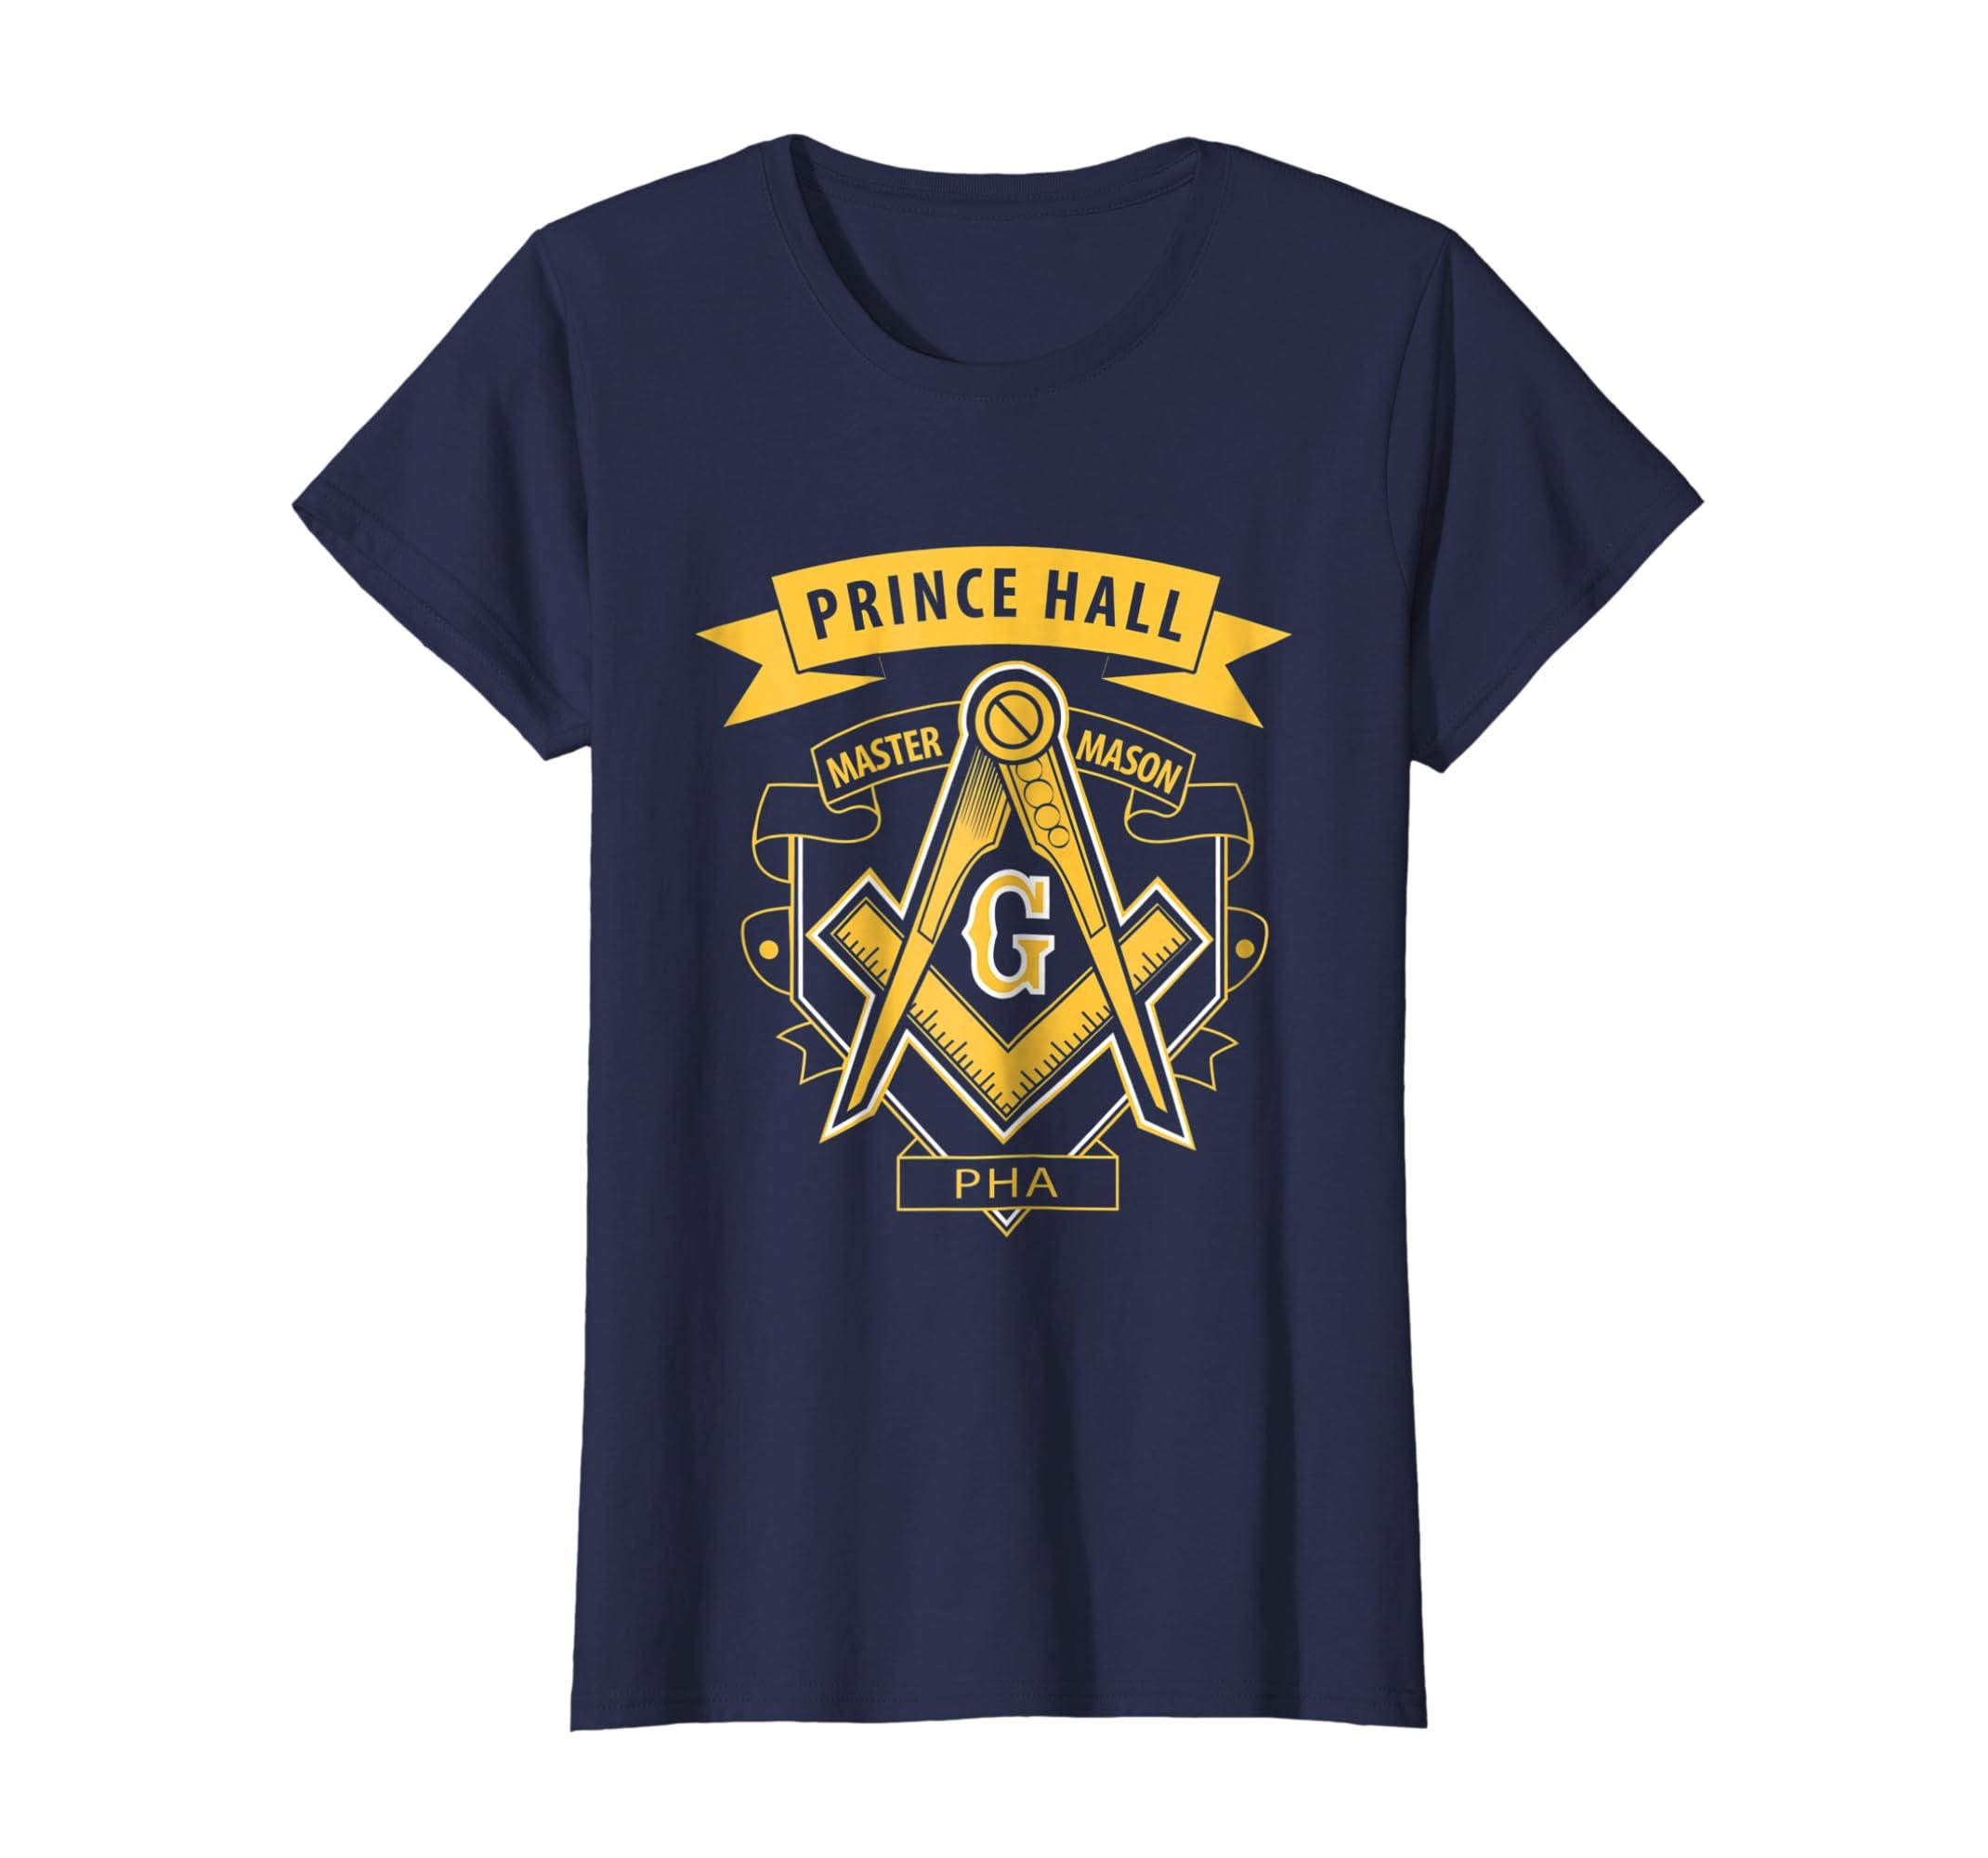 09cb039a Amazon.com: Freemason: Prince Hall Master Mason PHA T-Shirt Gift: Clothing